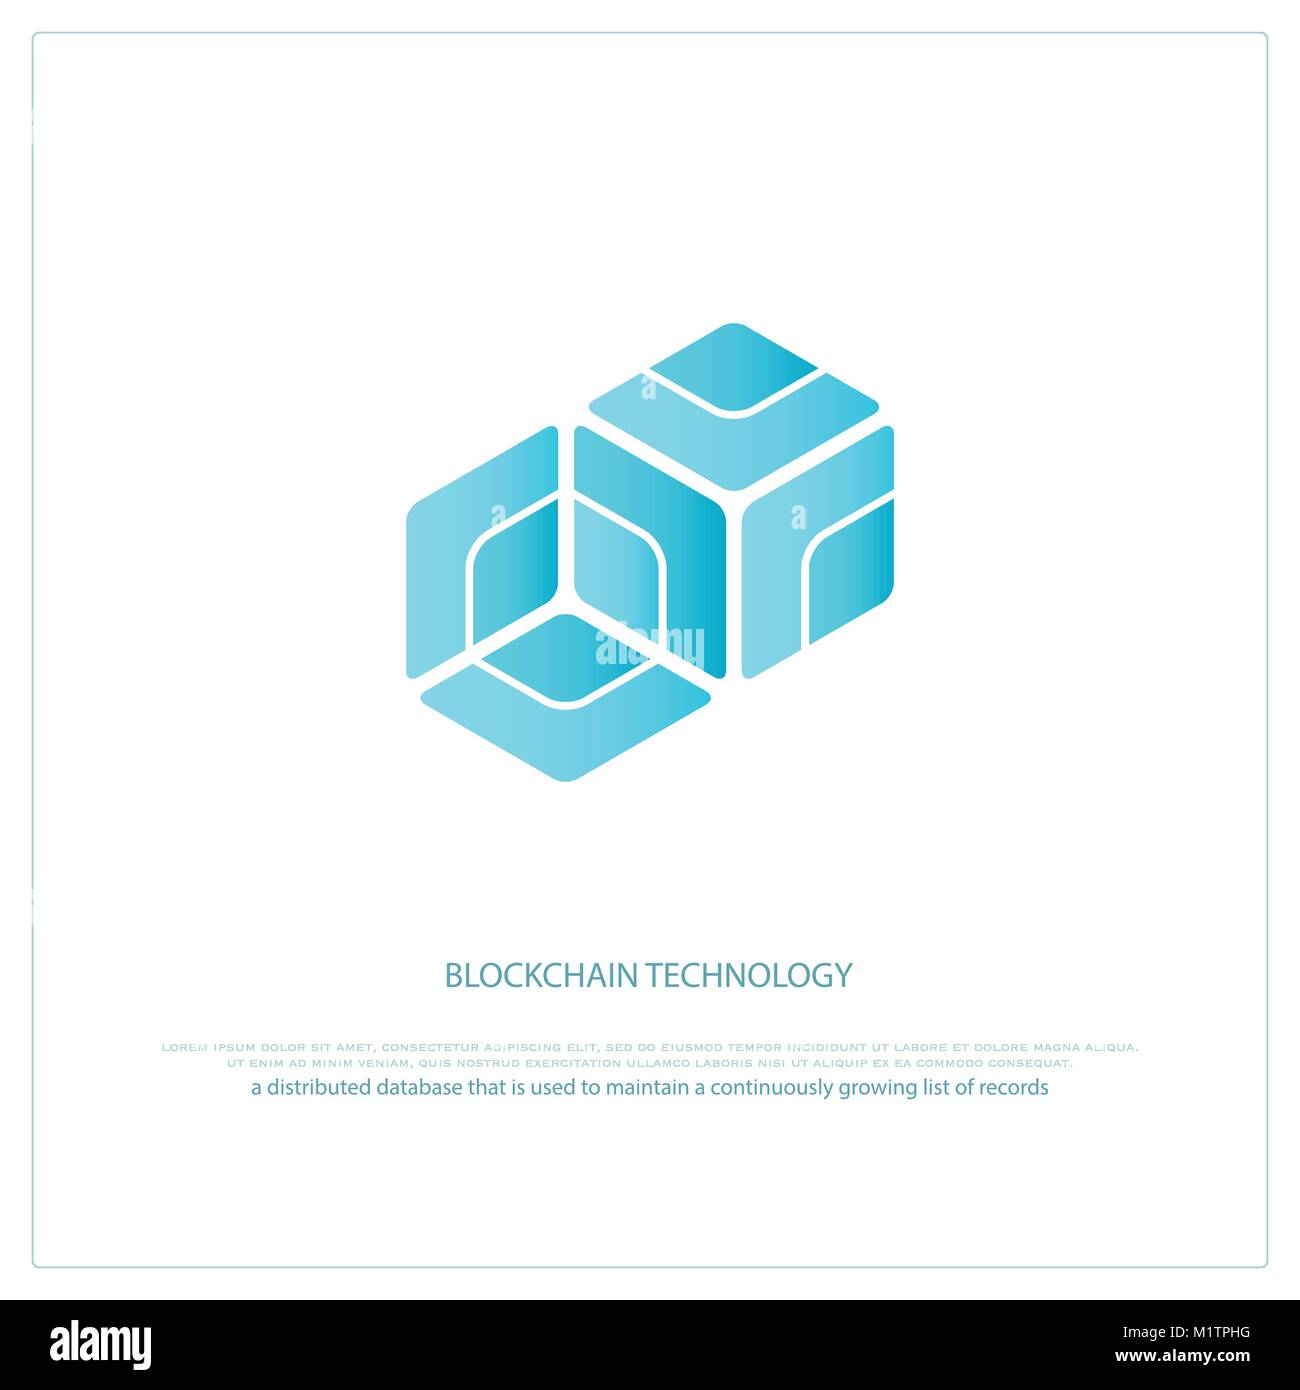 blockchain technology icon vector smart contract block isolated